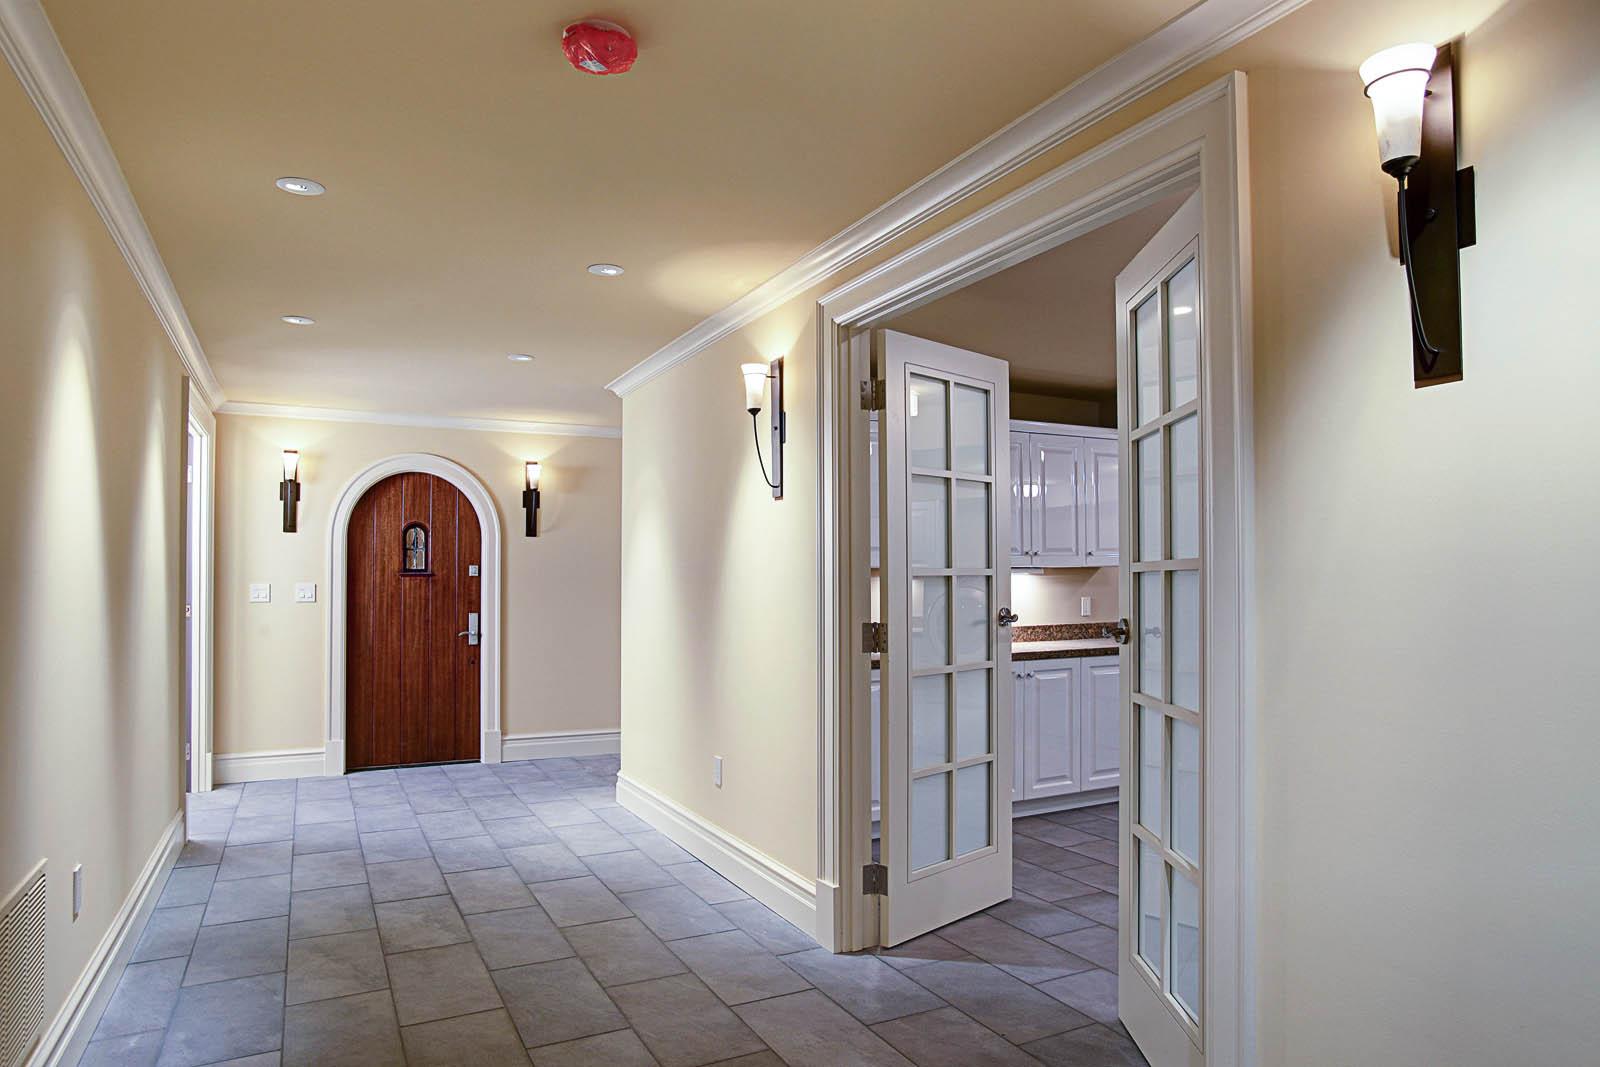 porcelain-tile-floor_2